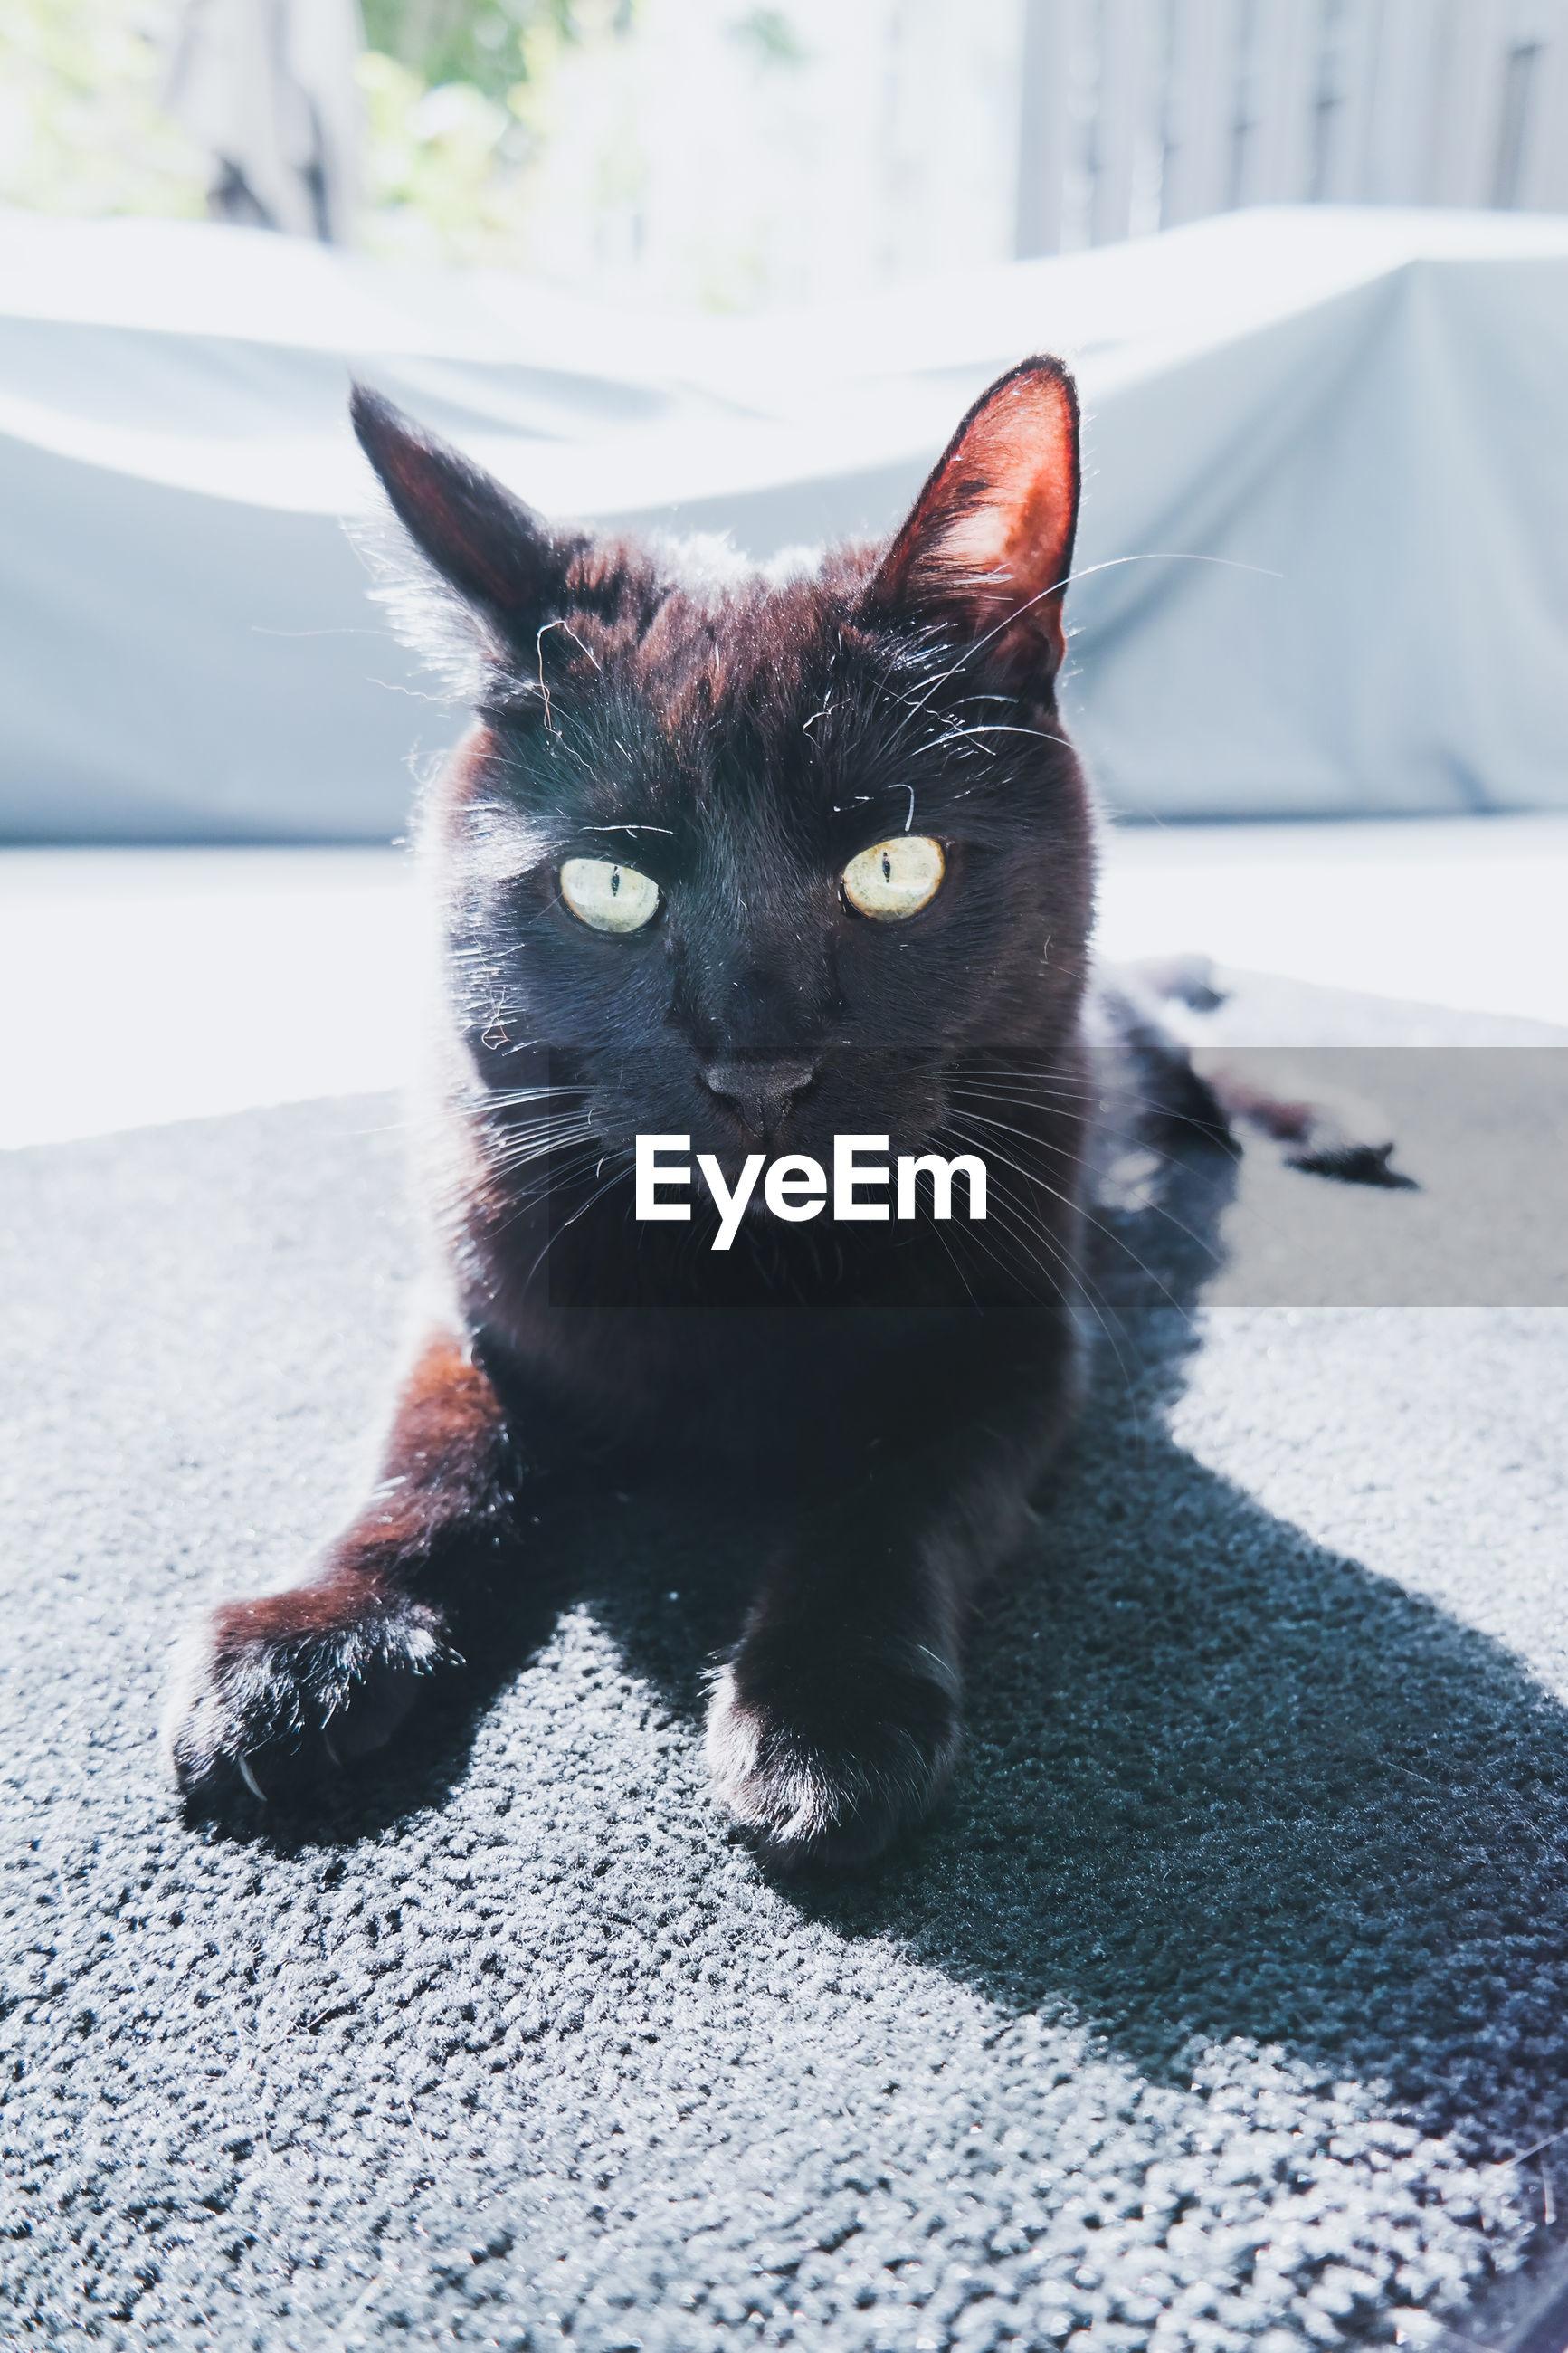 CLOSE-UP PORTRAIT OF BLACK CAT SITTING ON FLOOR